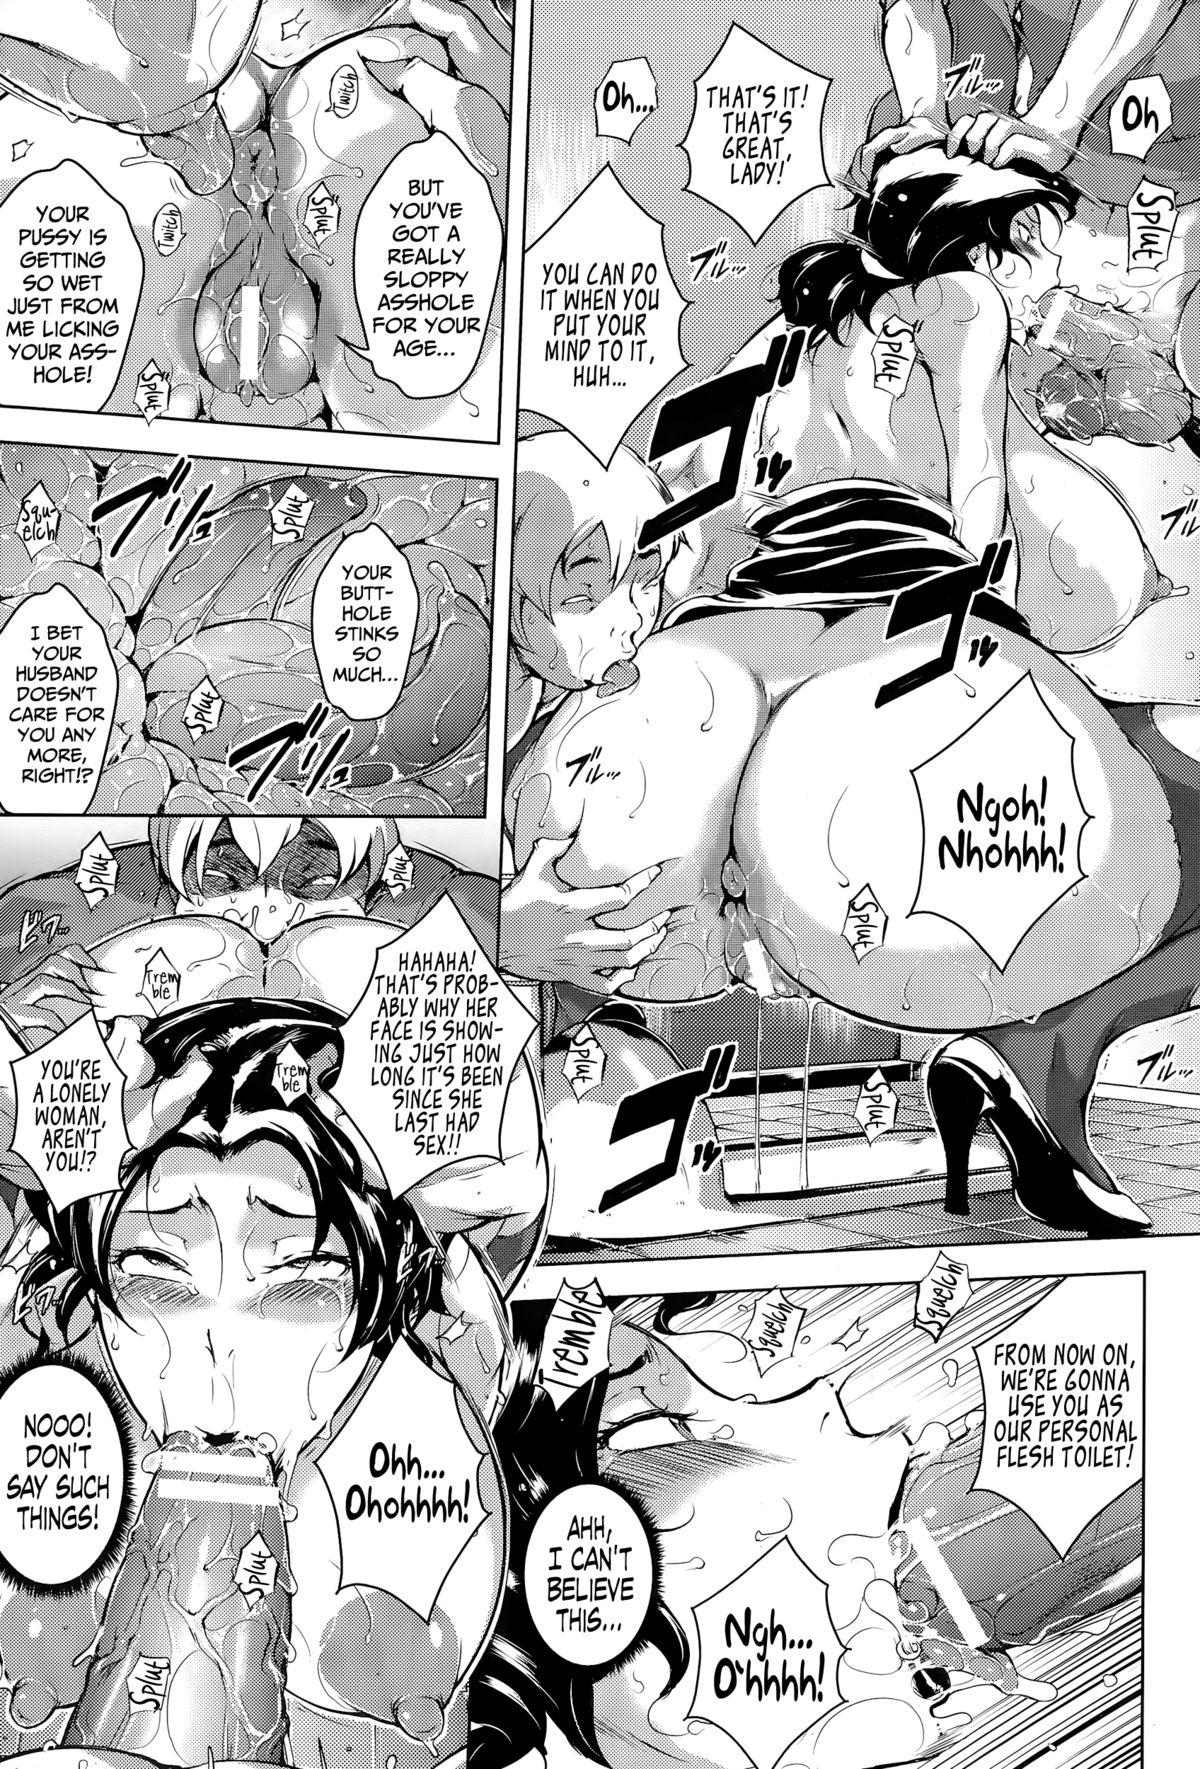 Ryoujyoku Chikan Kyuukou | Rapist Molester Express 10